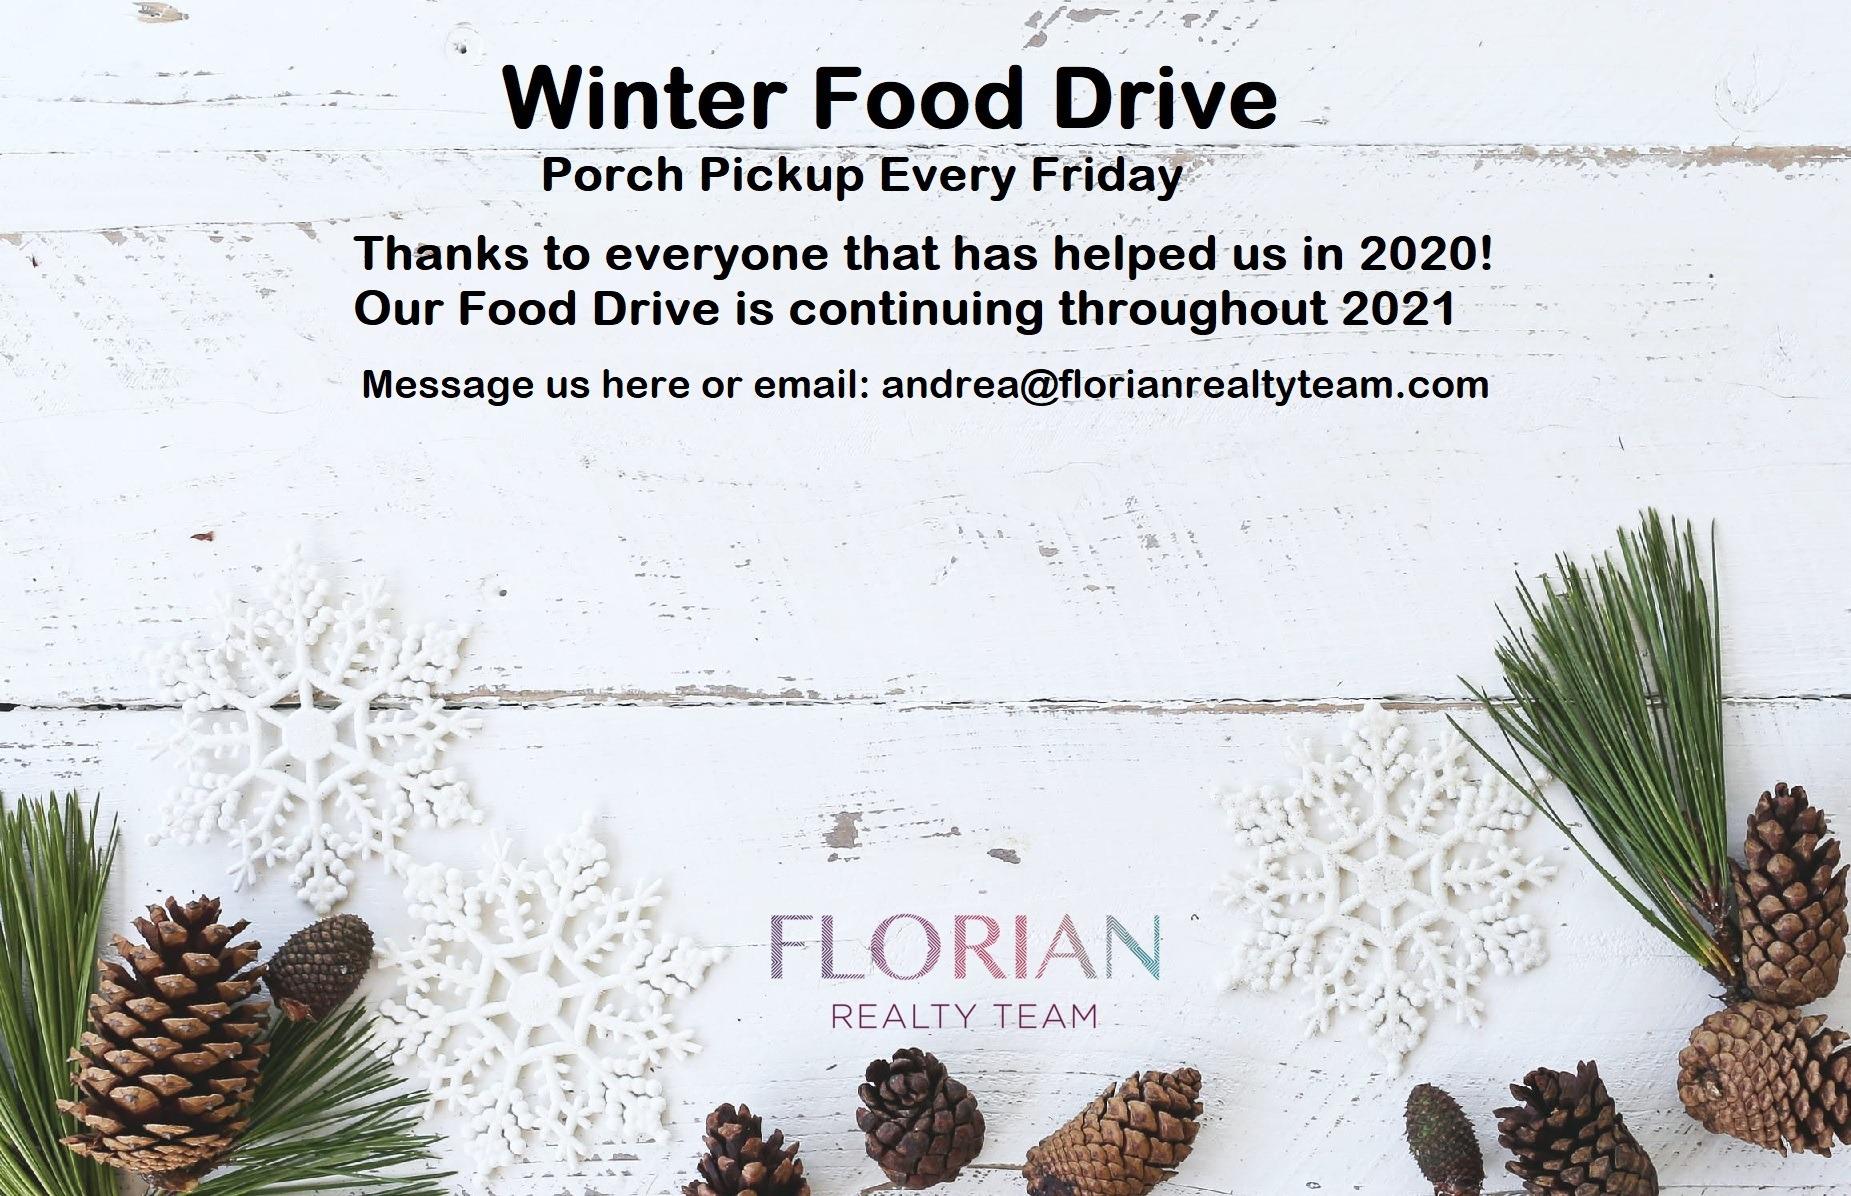 winter food drive info